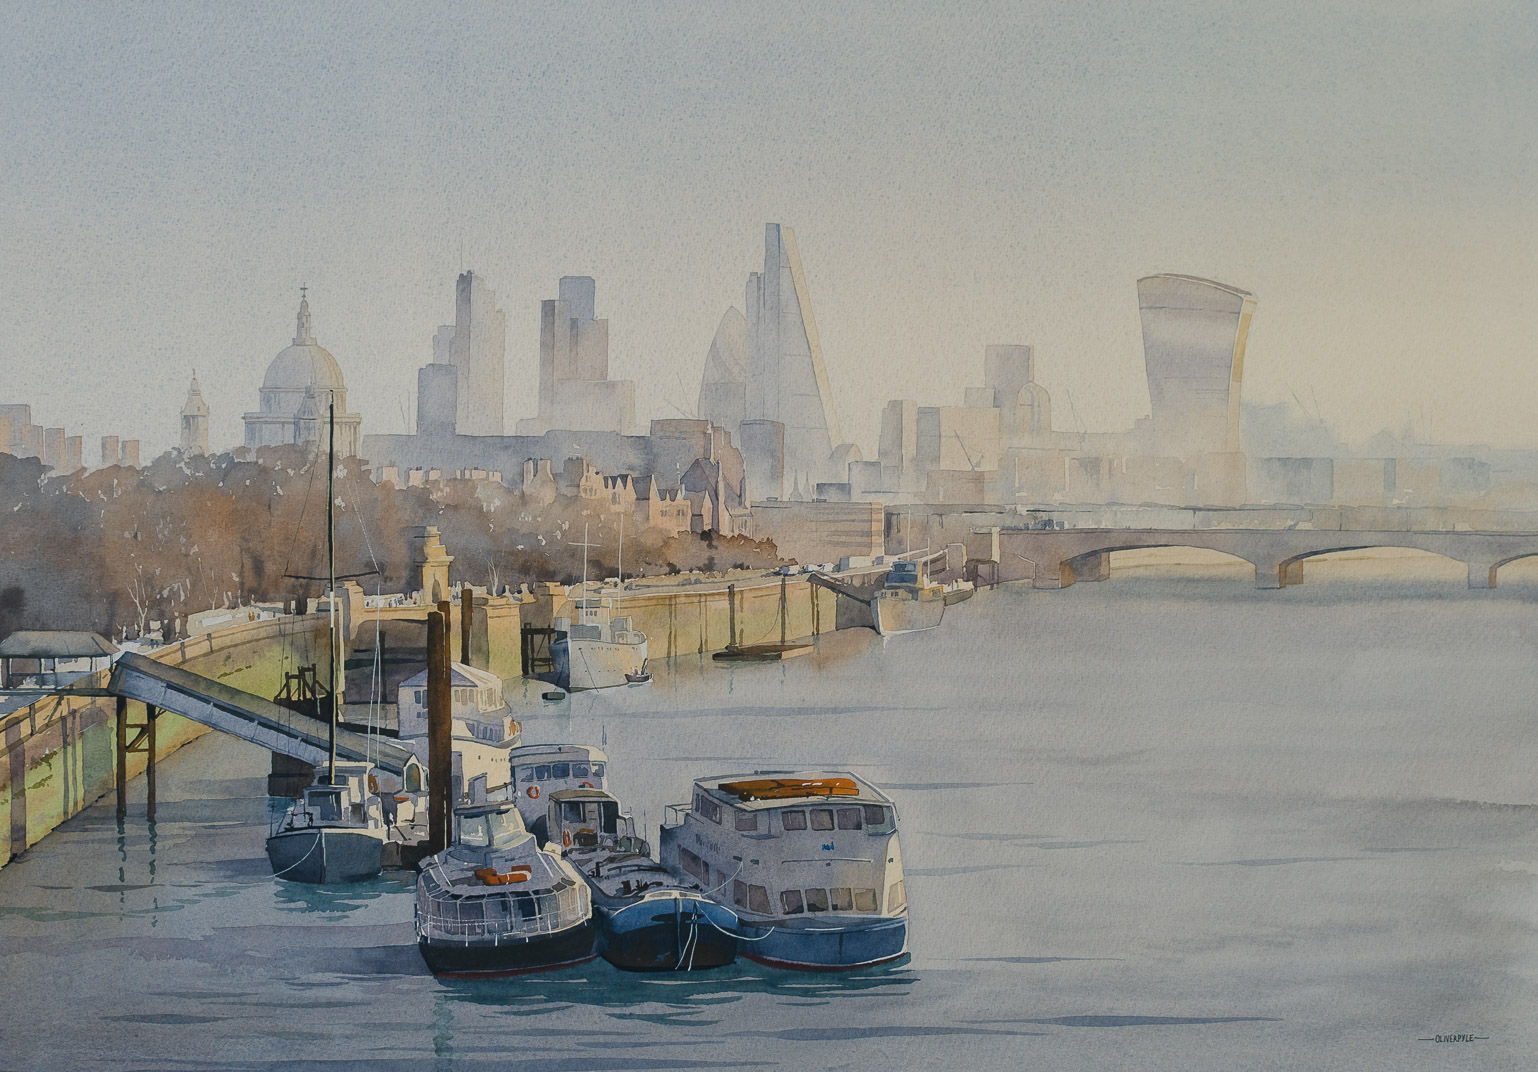 Downstream, from Waterloo Bridge